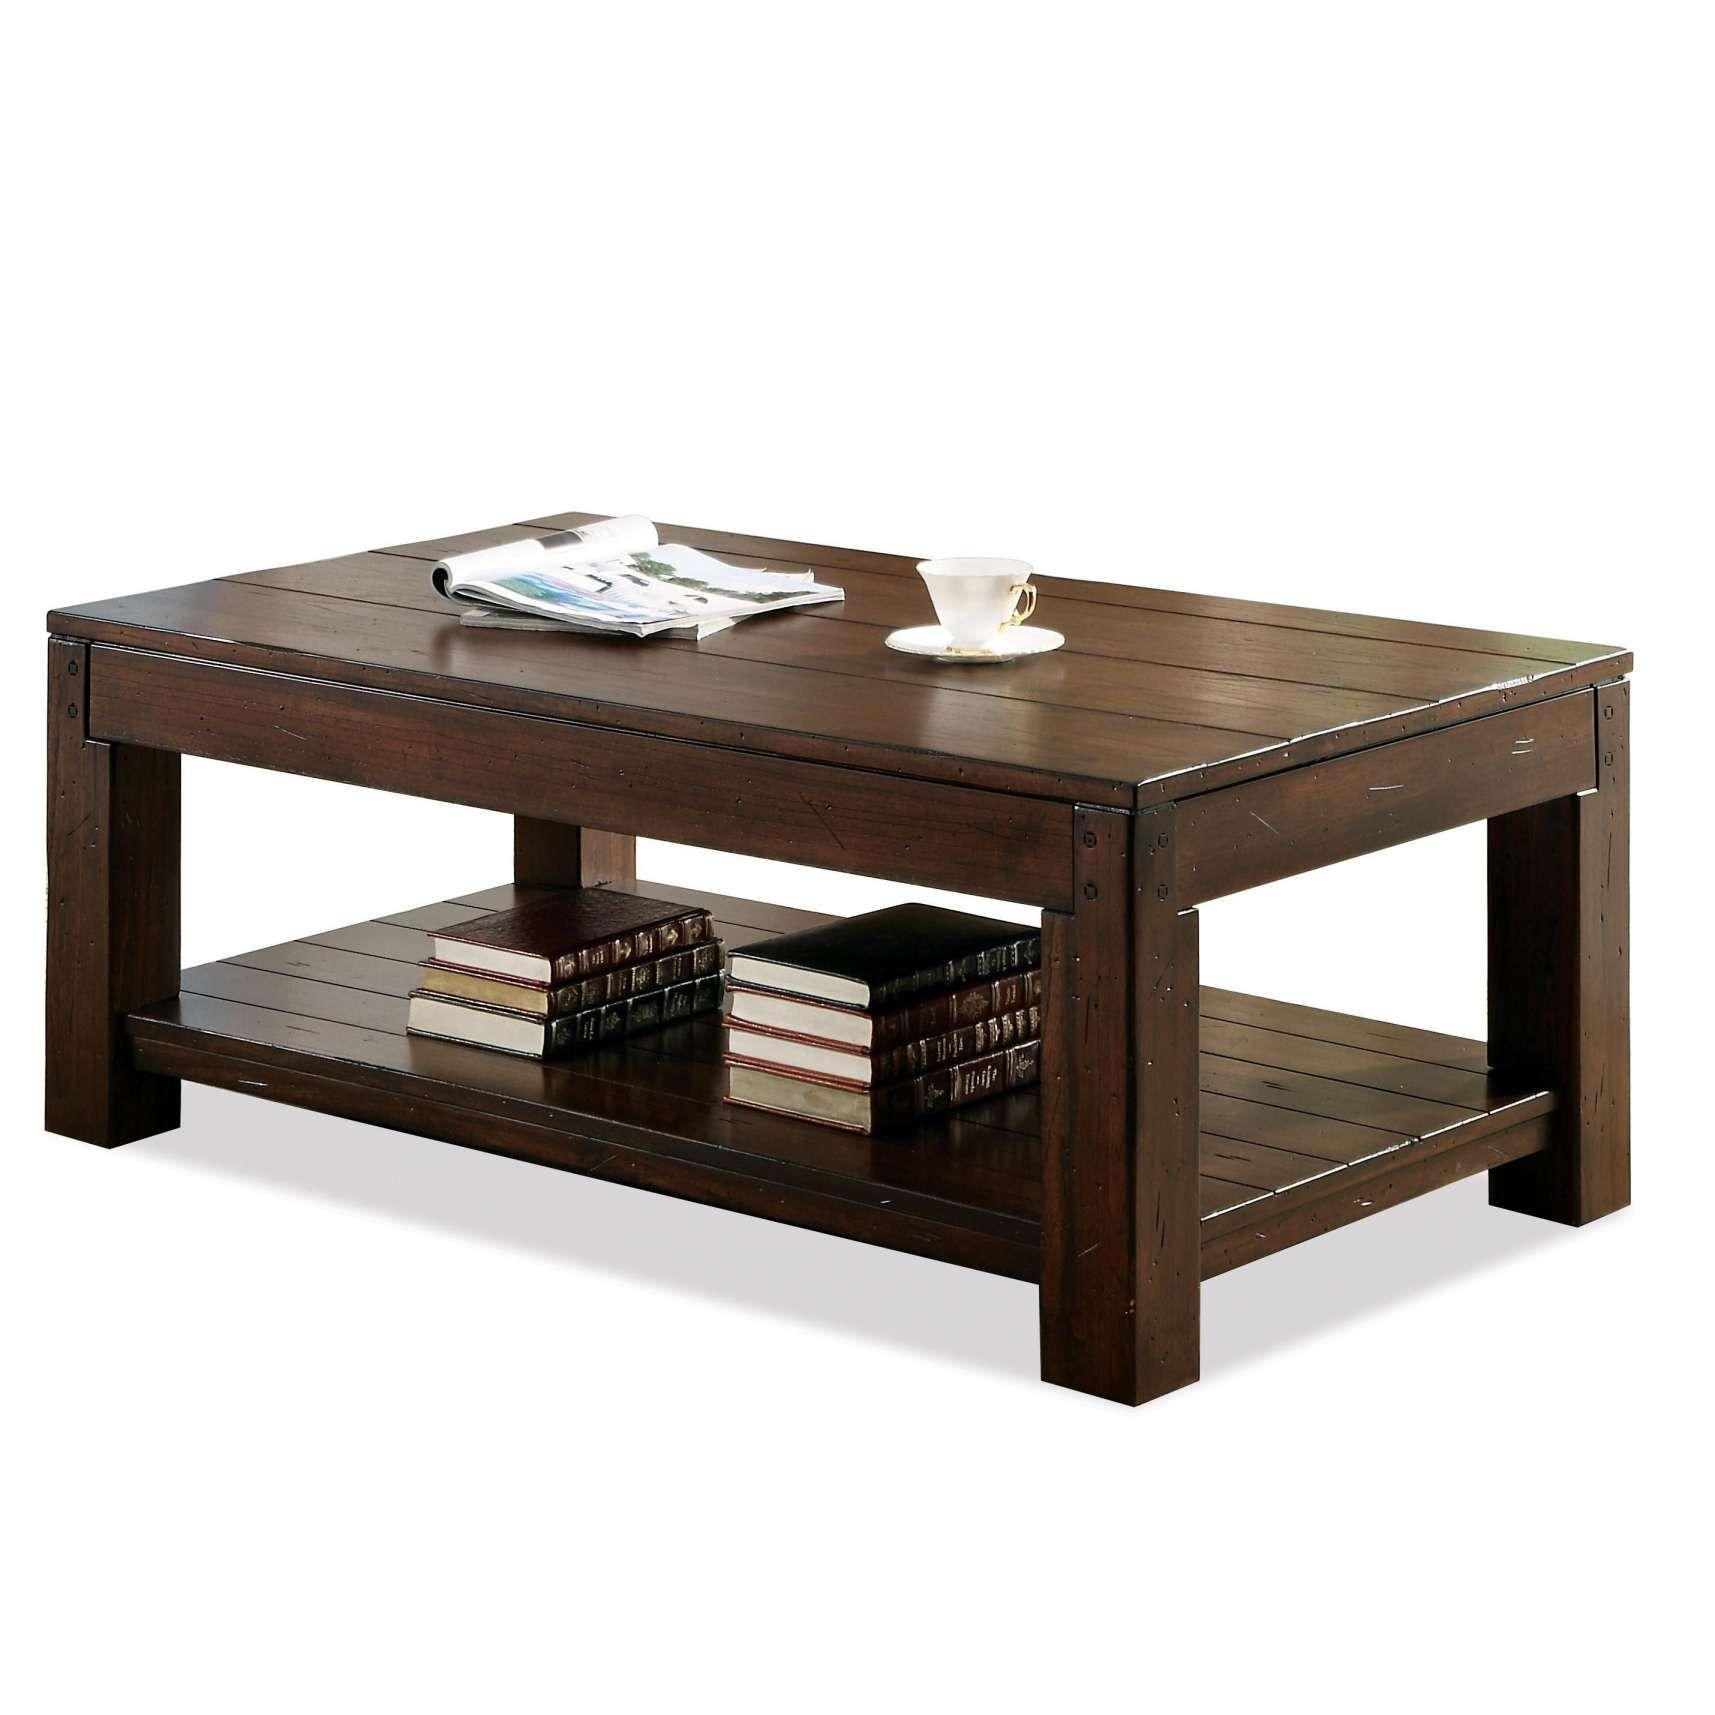 8 Best Riverside Furniture Castlewood Coffee Table Gallery Coffee Table Riverside Furniture Solid Wood Coffee Table [ 1715 x 1715 Pixel ]